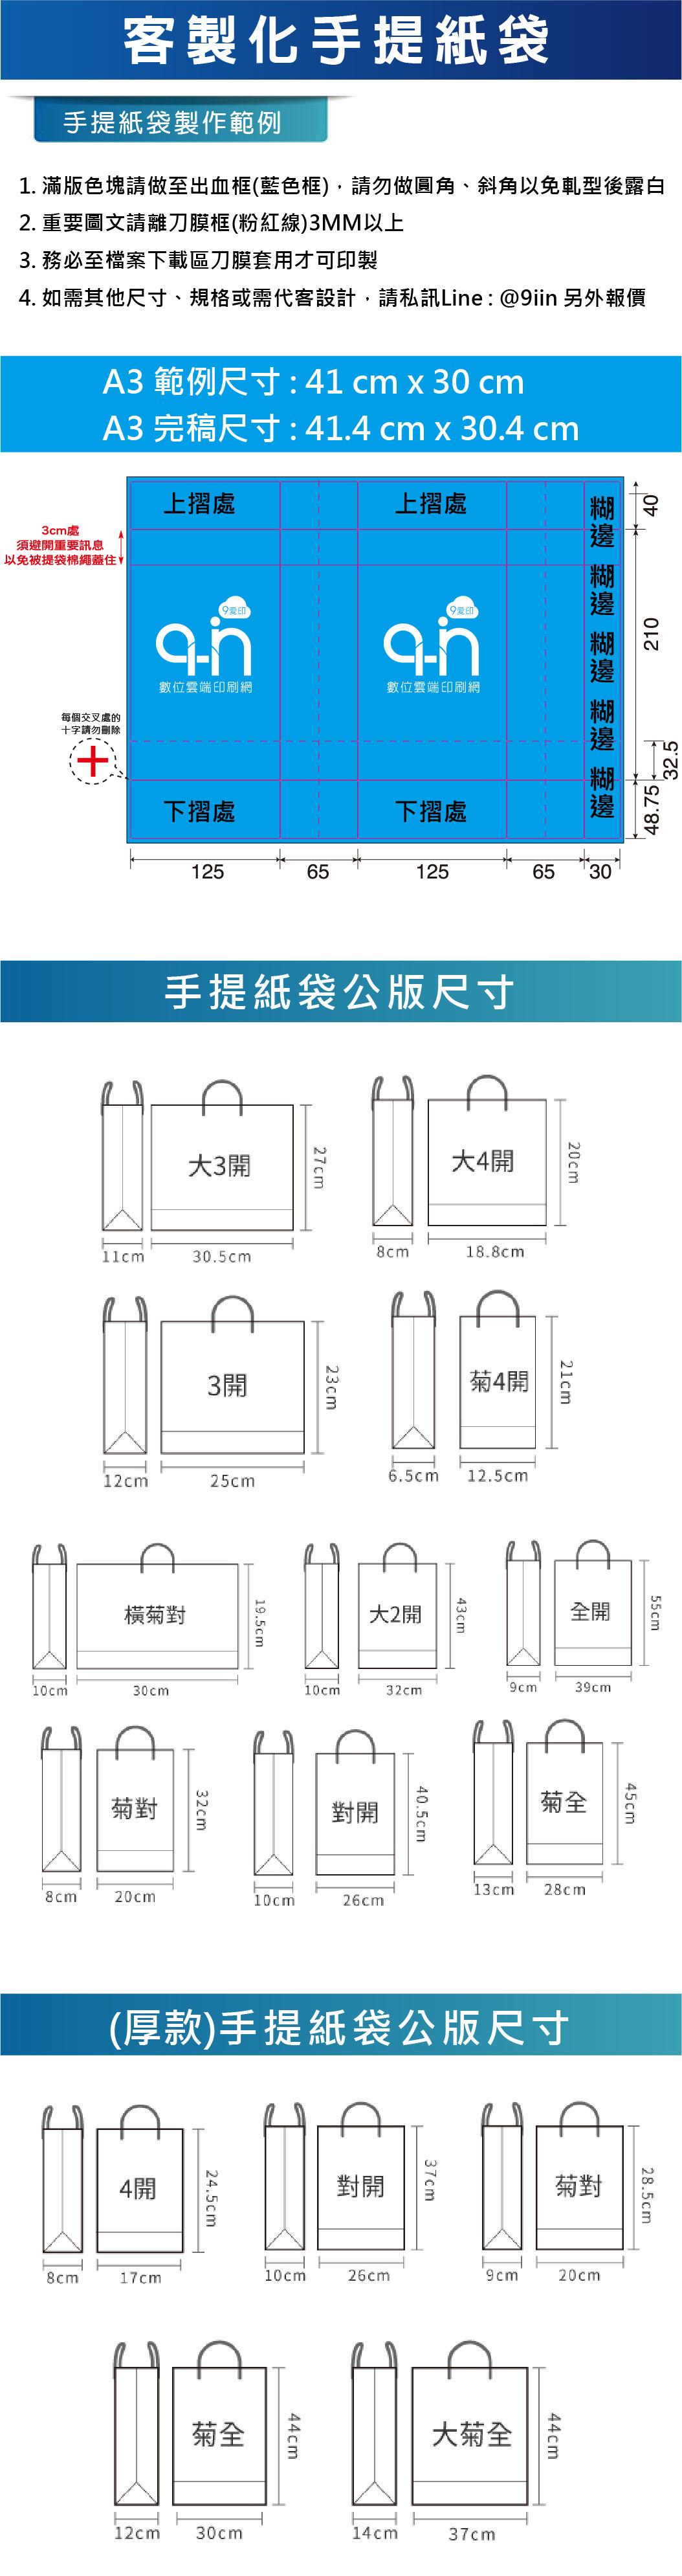 手提袋+免提袋-BANNER_手提紙袋-INSIDE.jpg